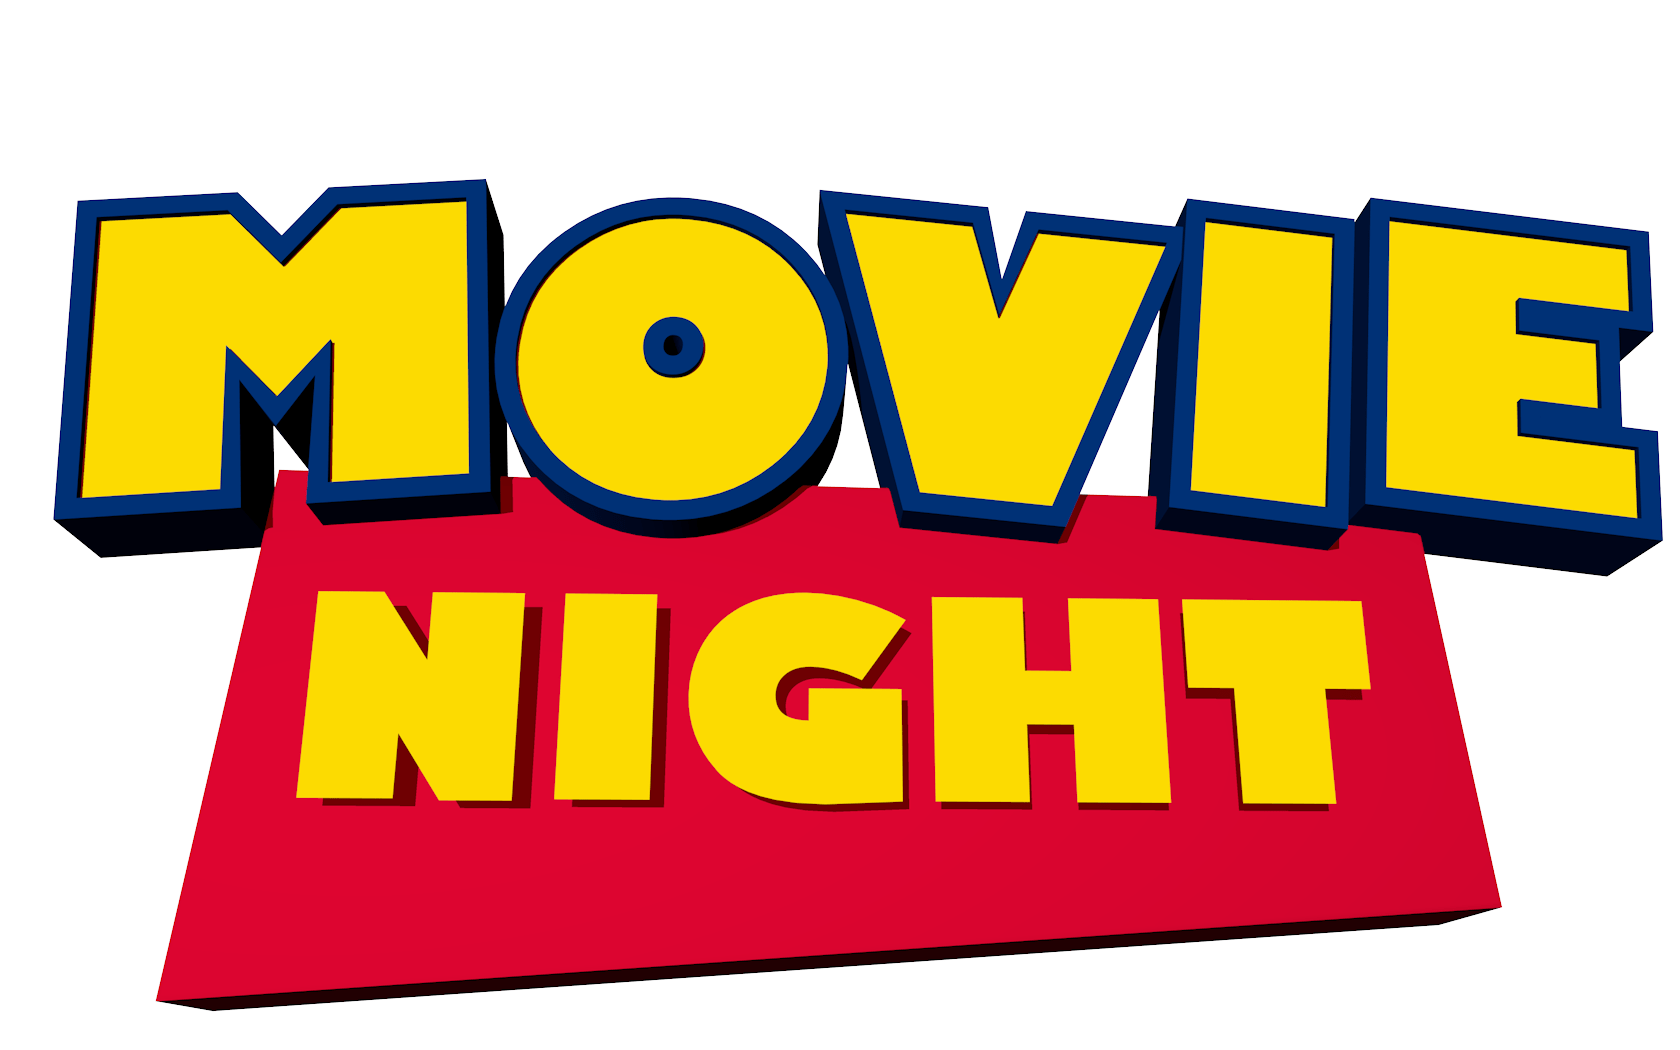 Movie clipart movie snack. A guide to hosting